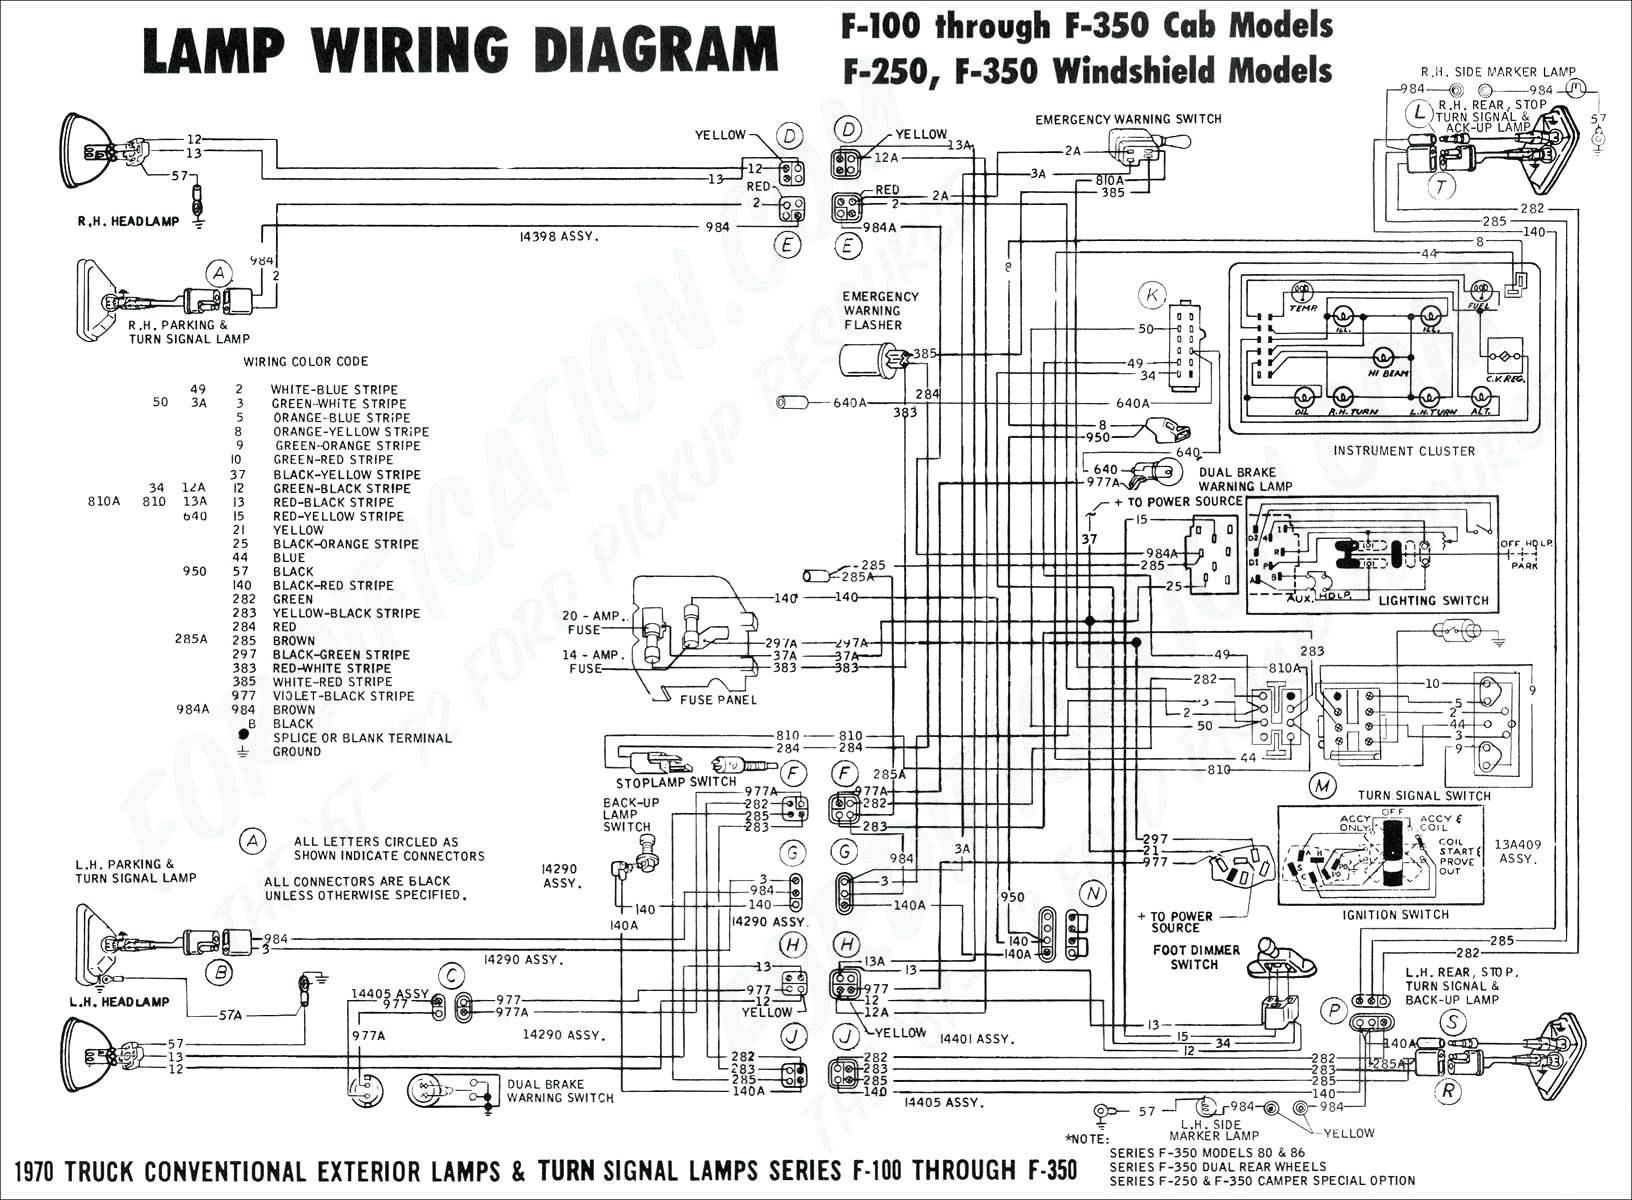 2006 Dodge Stratus Engine Diagram 2006 Dodge Wiring Diagram Another Blog About Wiring Diagram • Of 2006 Dodge Stratus Engine Diagram